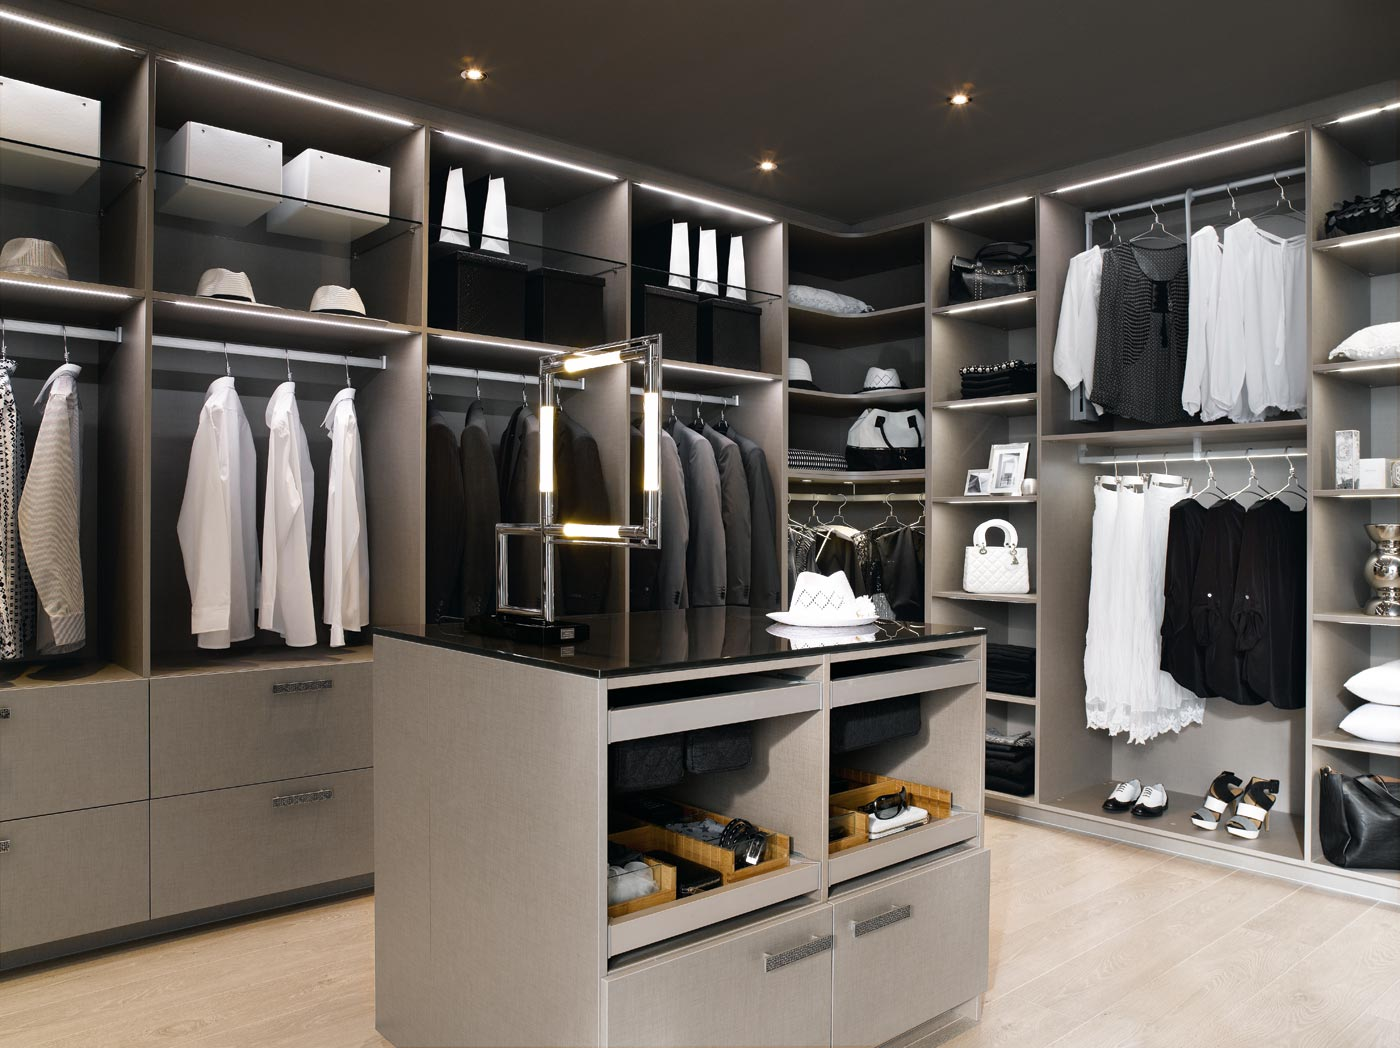 rangements dressing ecrin d 39 l gance perene lyon faure. Black Bedroom Furniture Sets. Home Design Ideas